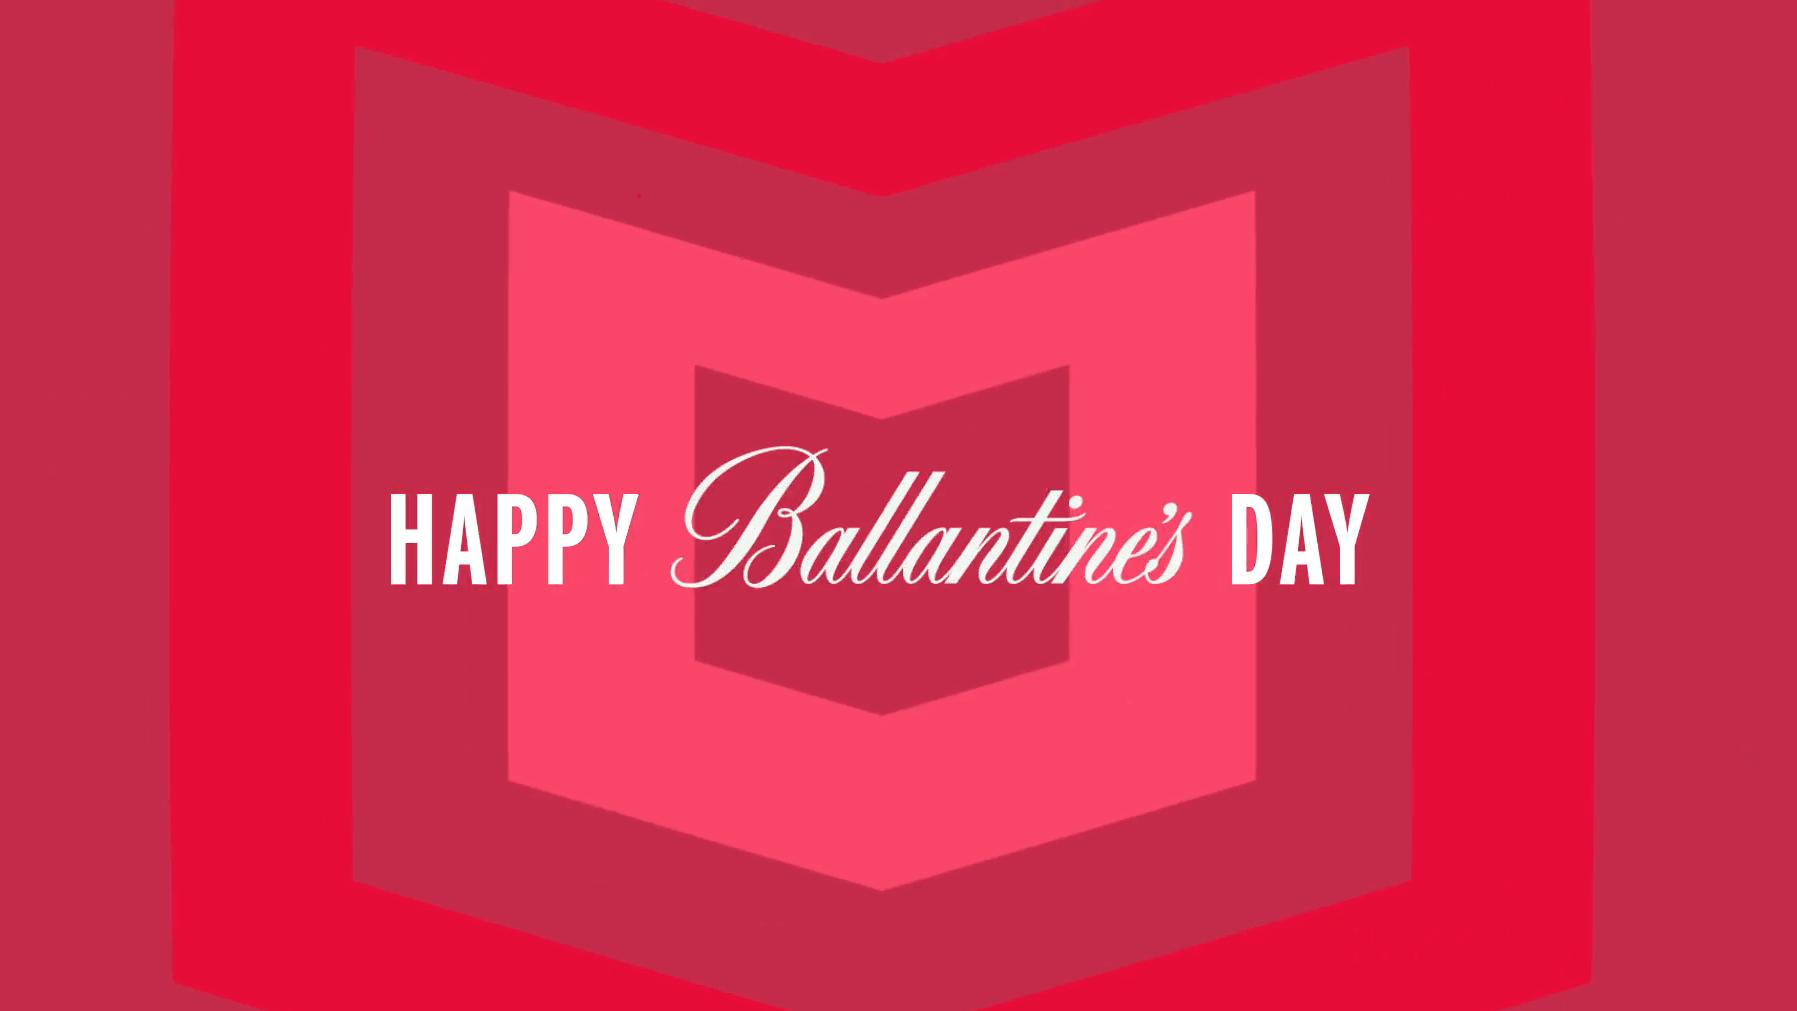 Happy Ballantine's day